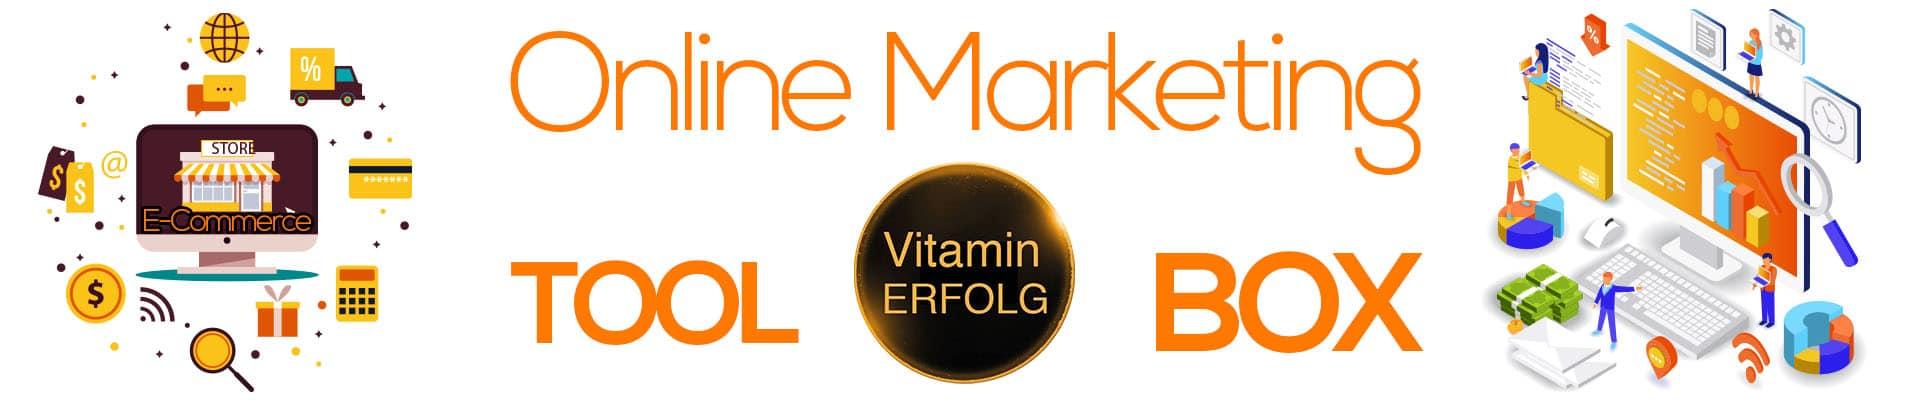 Toolbox Header Vitaminerfolg Blog